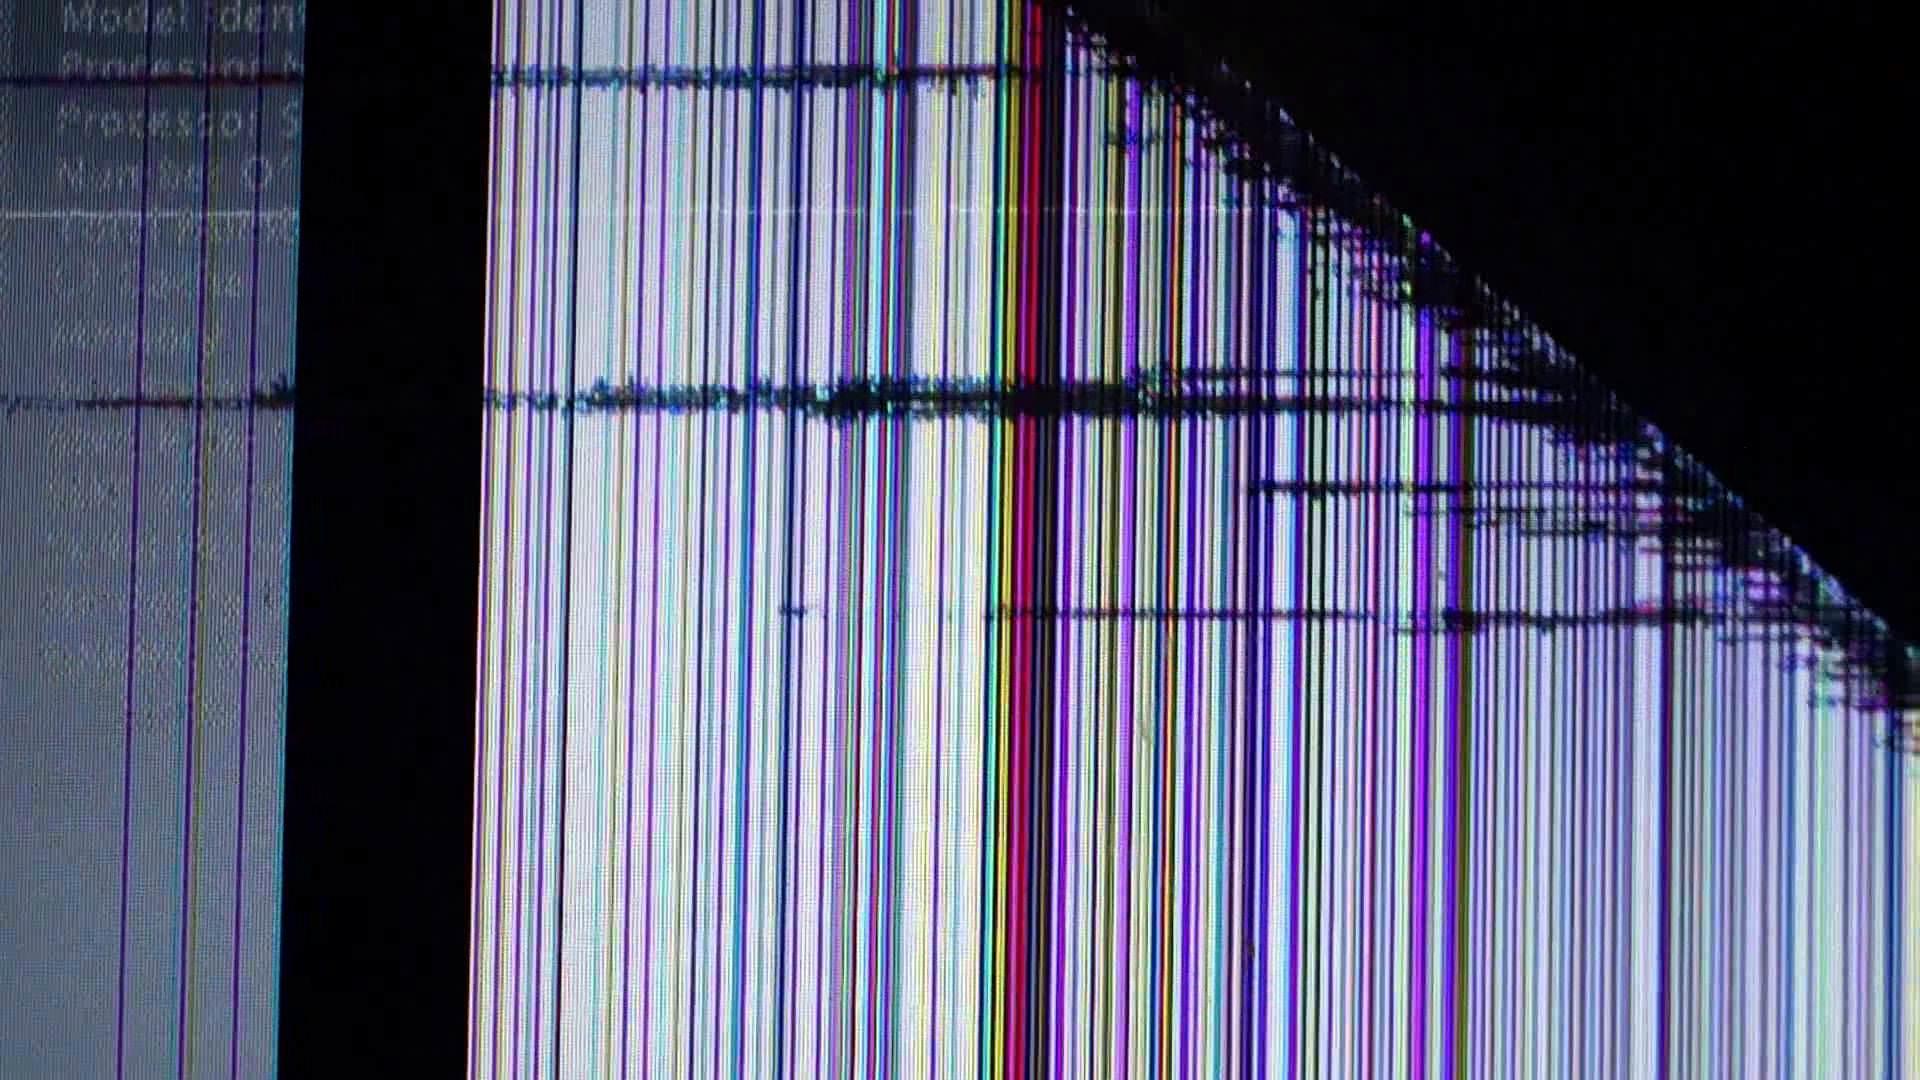 broken-screen-cracked-screen-prank-on-the-App-Store-wallpaper-wpc9003203